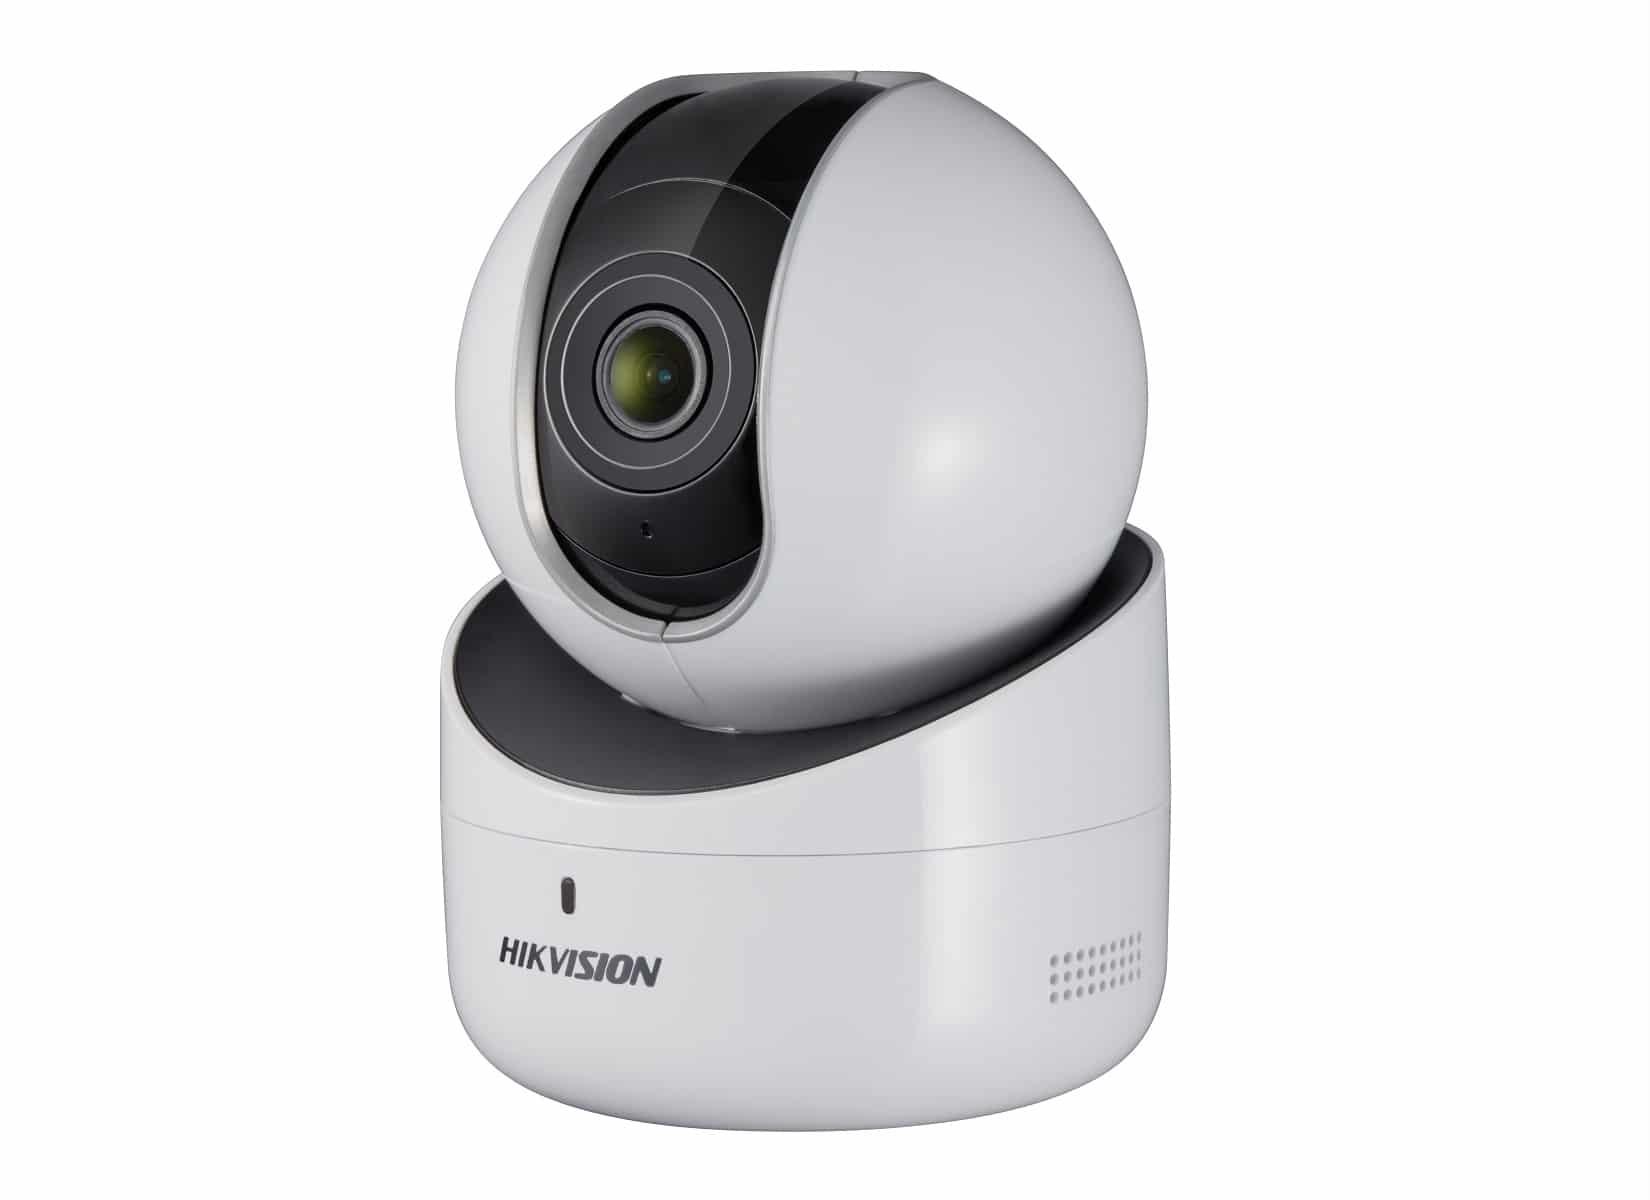 Recorder Dvr Cameras Security